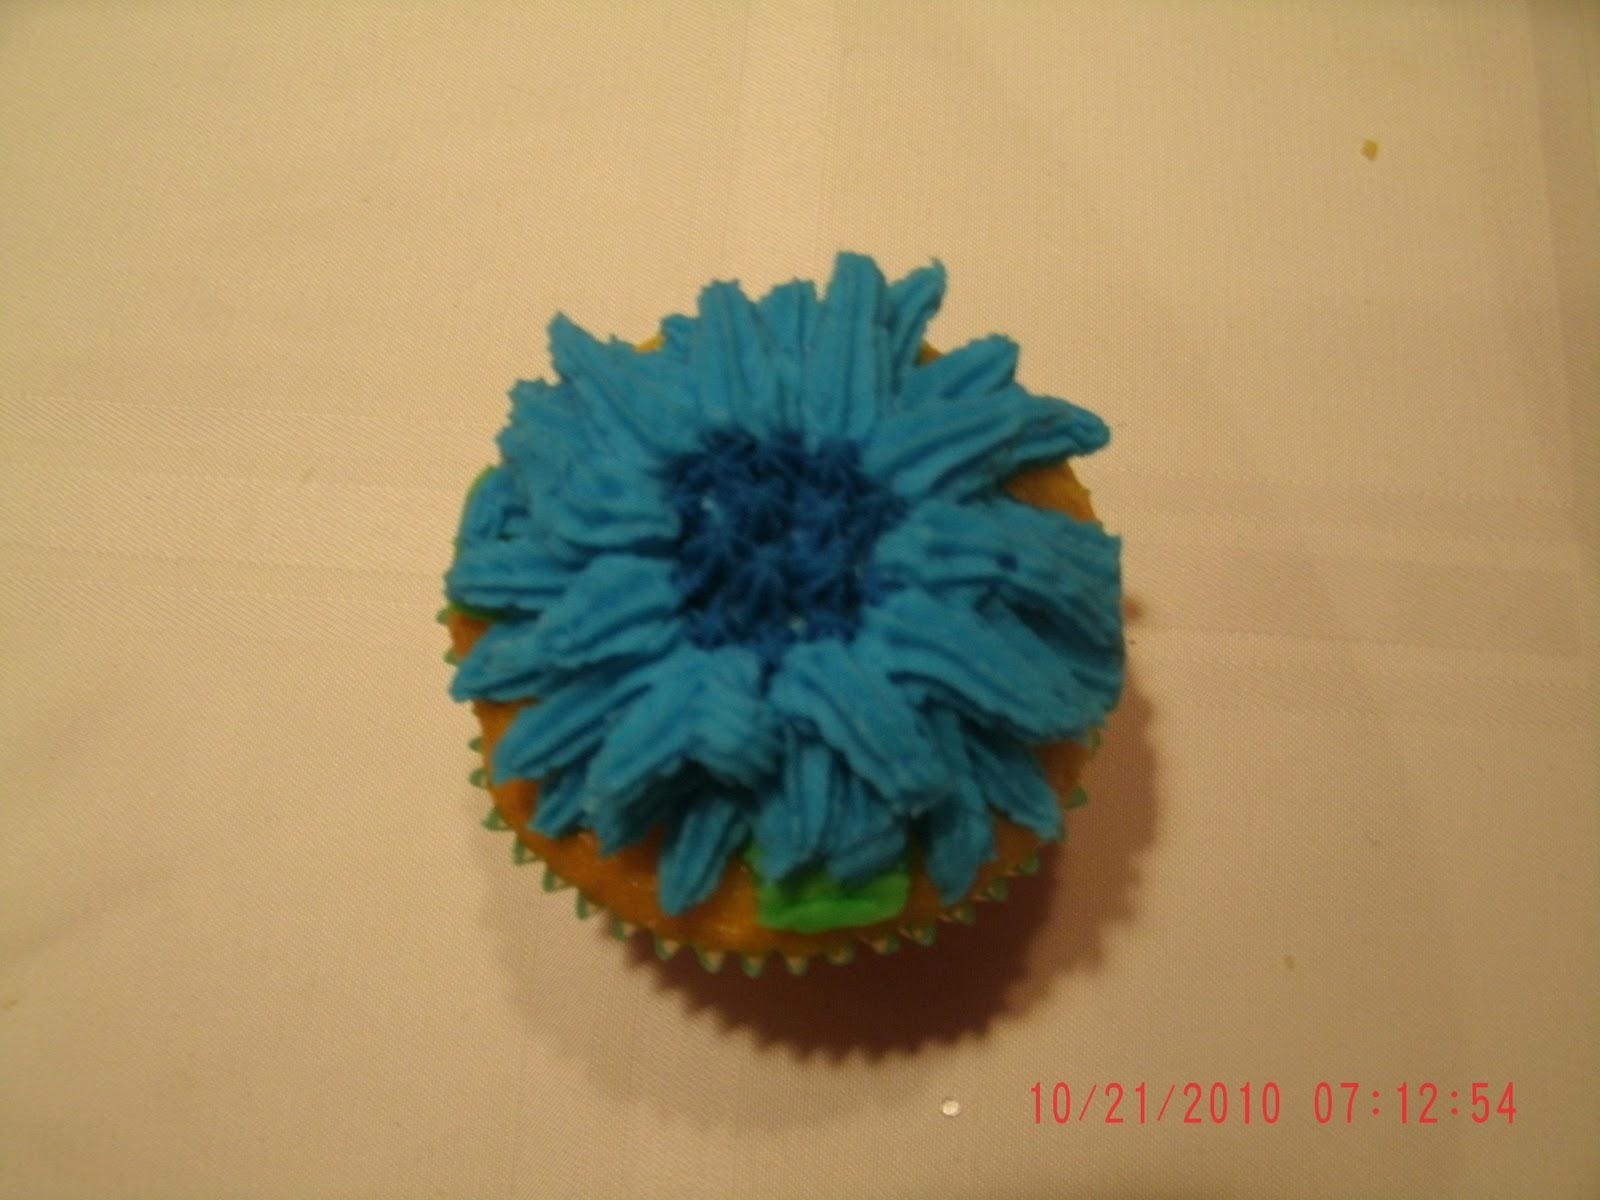 Big Bettie cakes: Lemon Flavored Flower Cupcakes